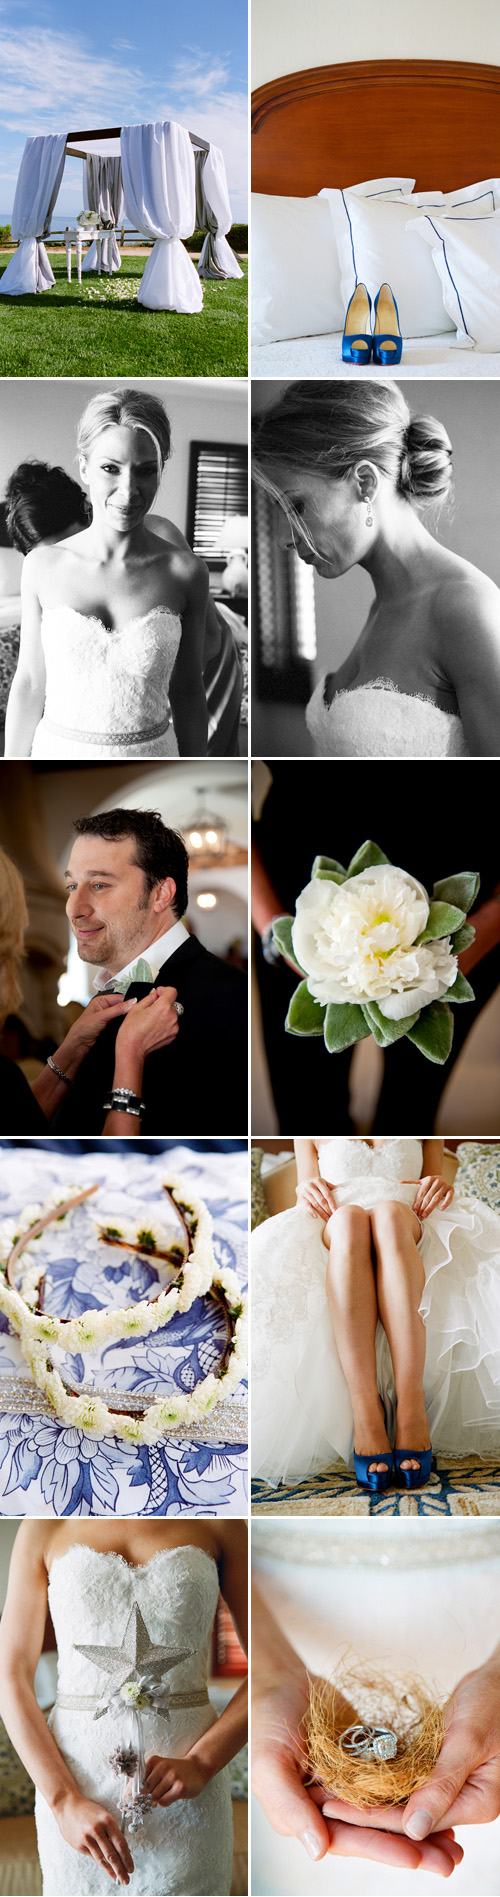 Santa Barbara, California wedding at the Bacara Resort by Yvette Roman Photography and La Fete Weddings